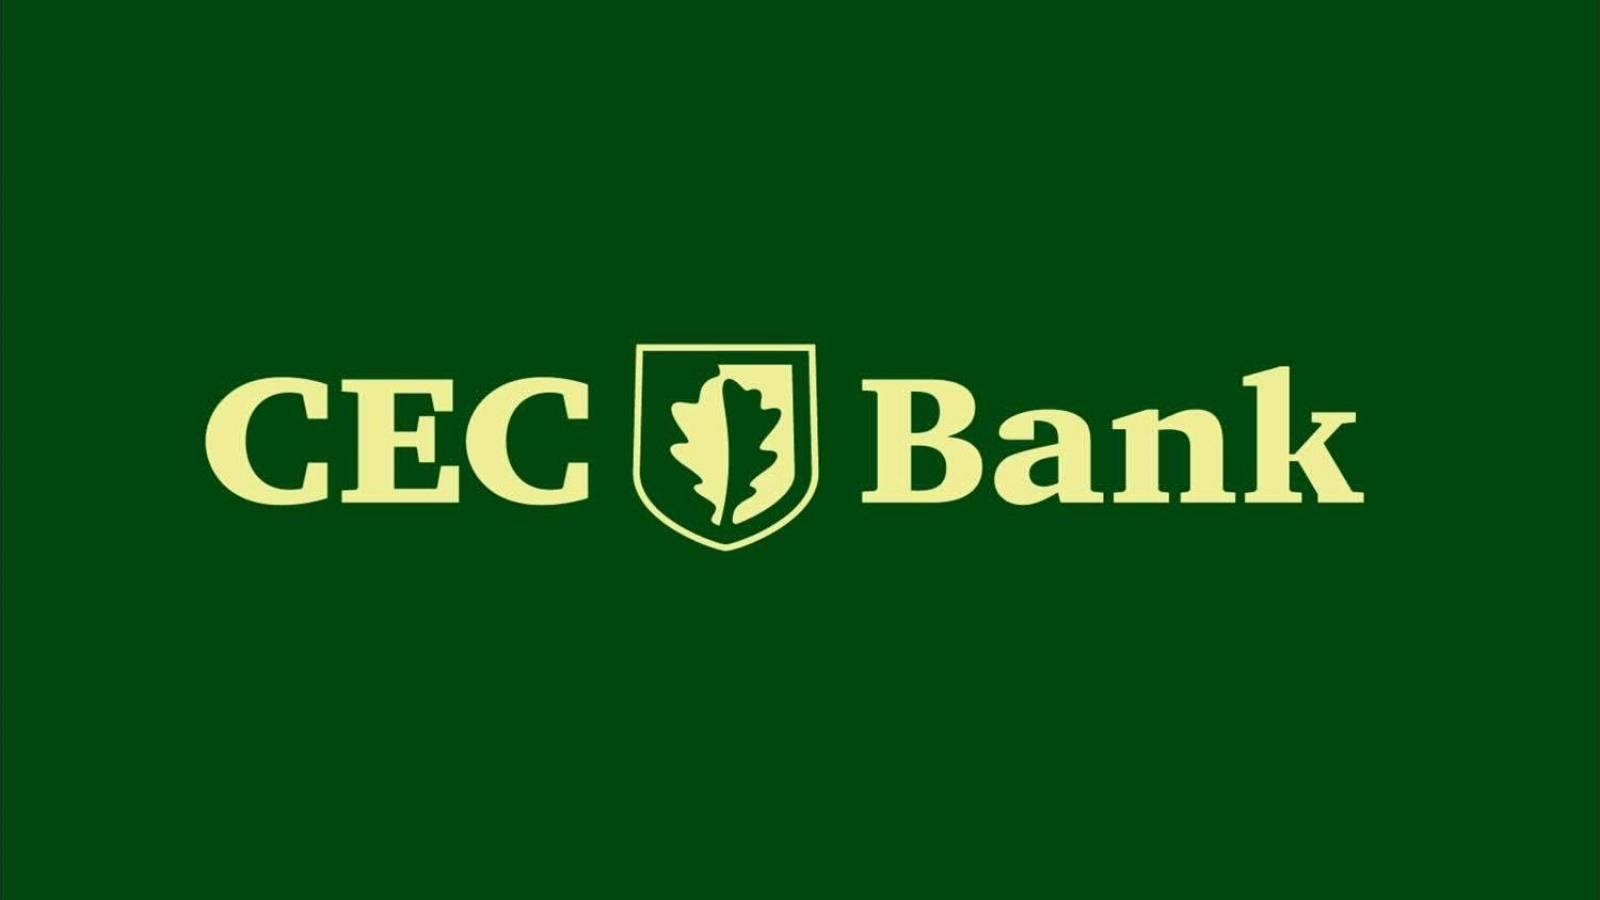 CEC Bank formular